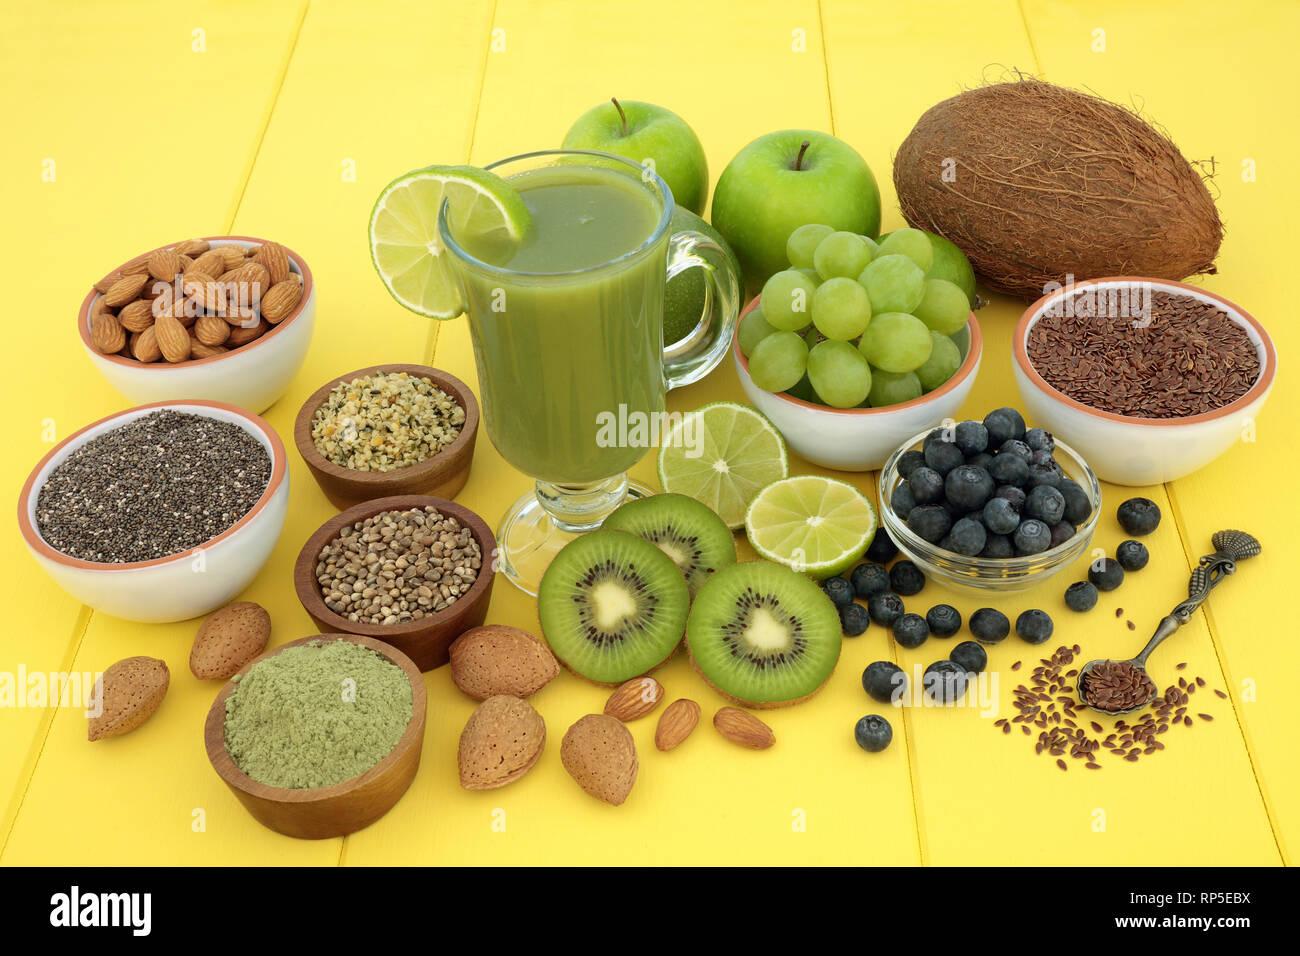 Vegan Health Food Smoothie Juice Drink With Fresh Fruit Matcha Powder Nuts Chia Flax And Hemp Husk Seed On Yellow Wood Background Stock Photo Alamy